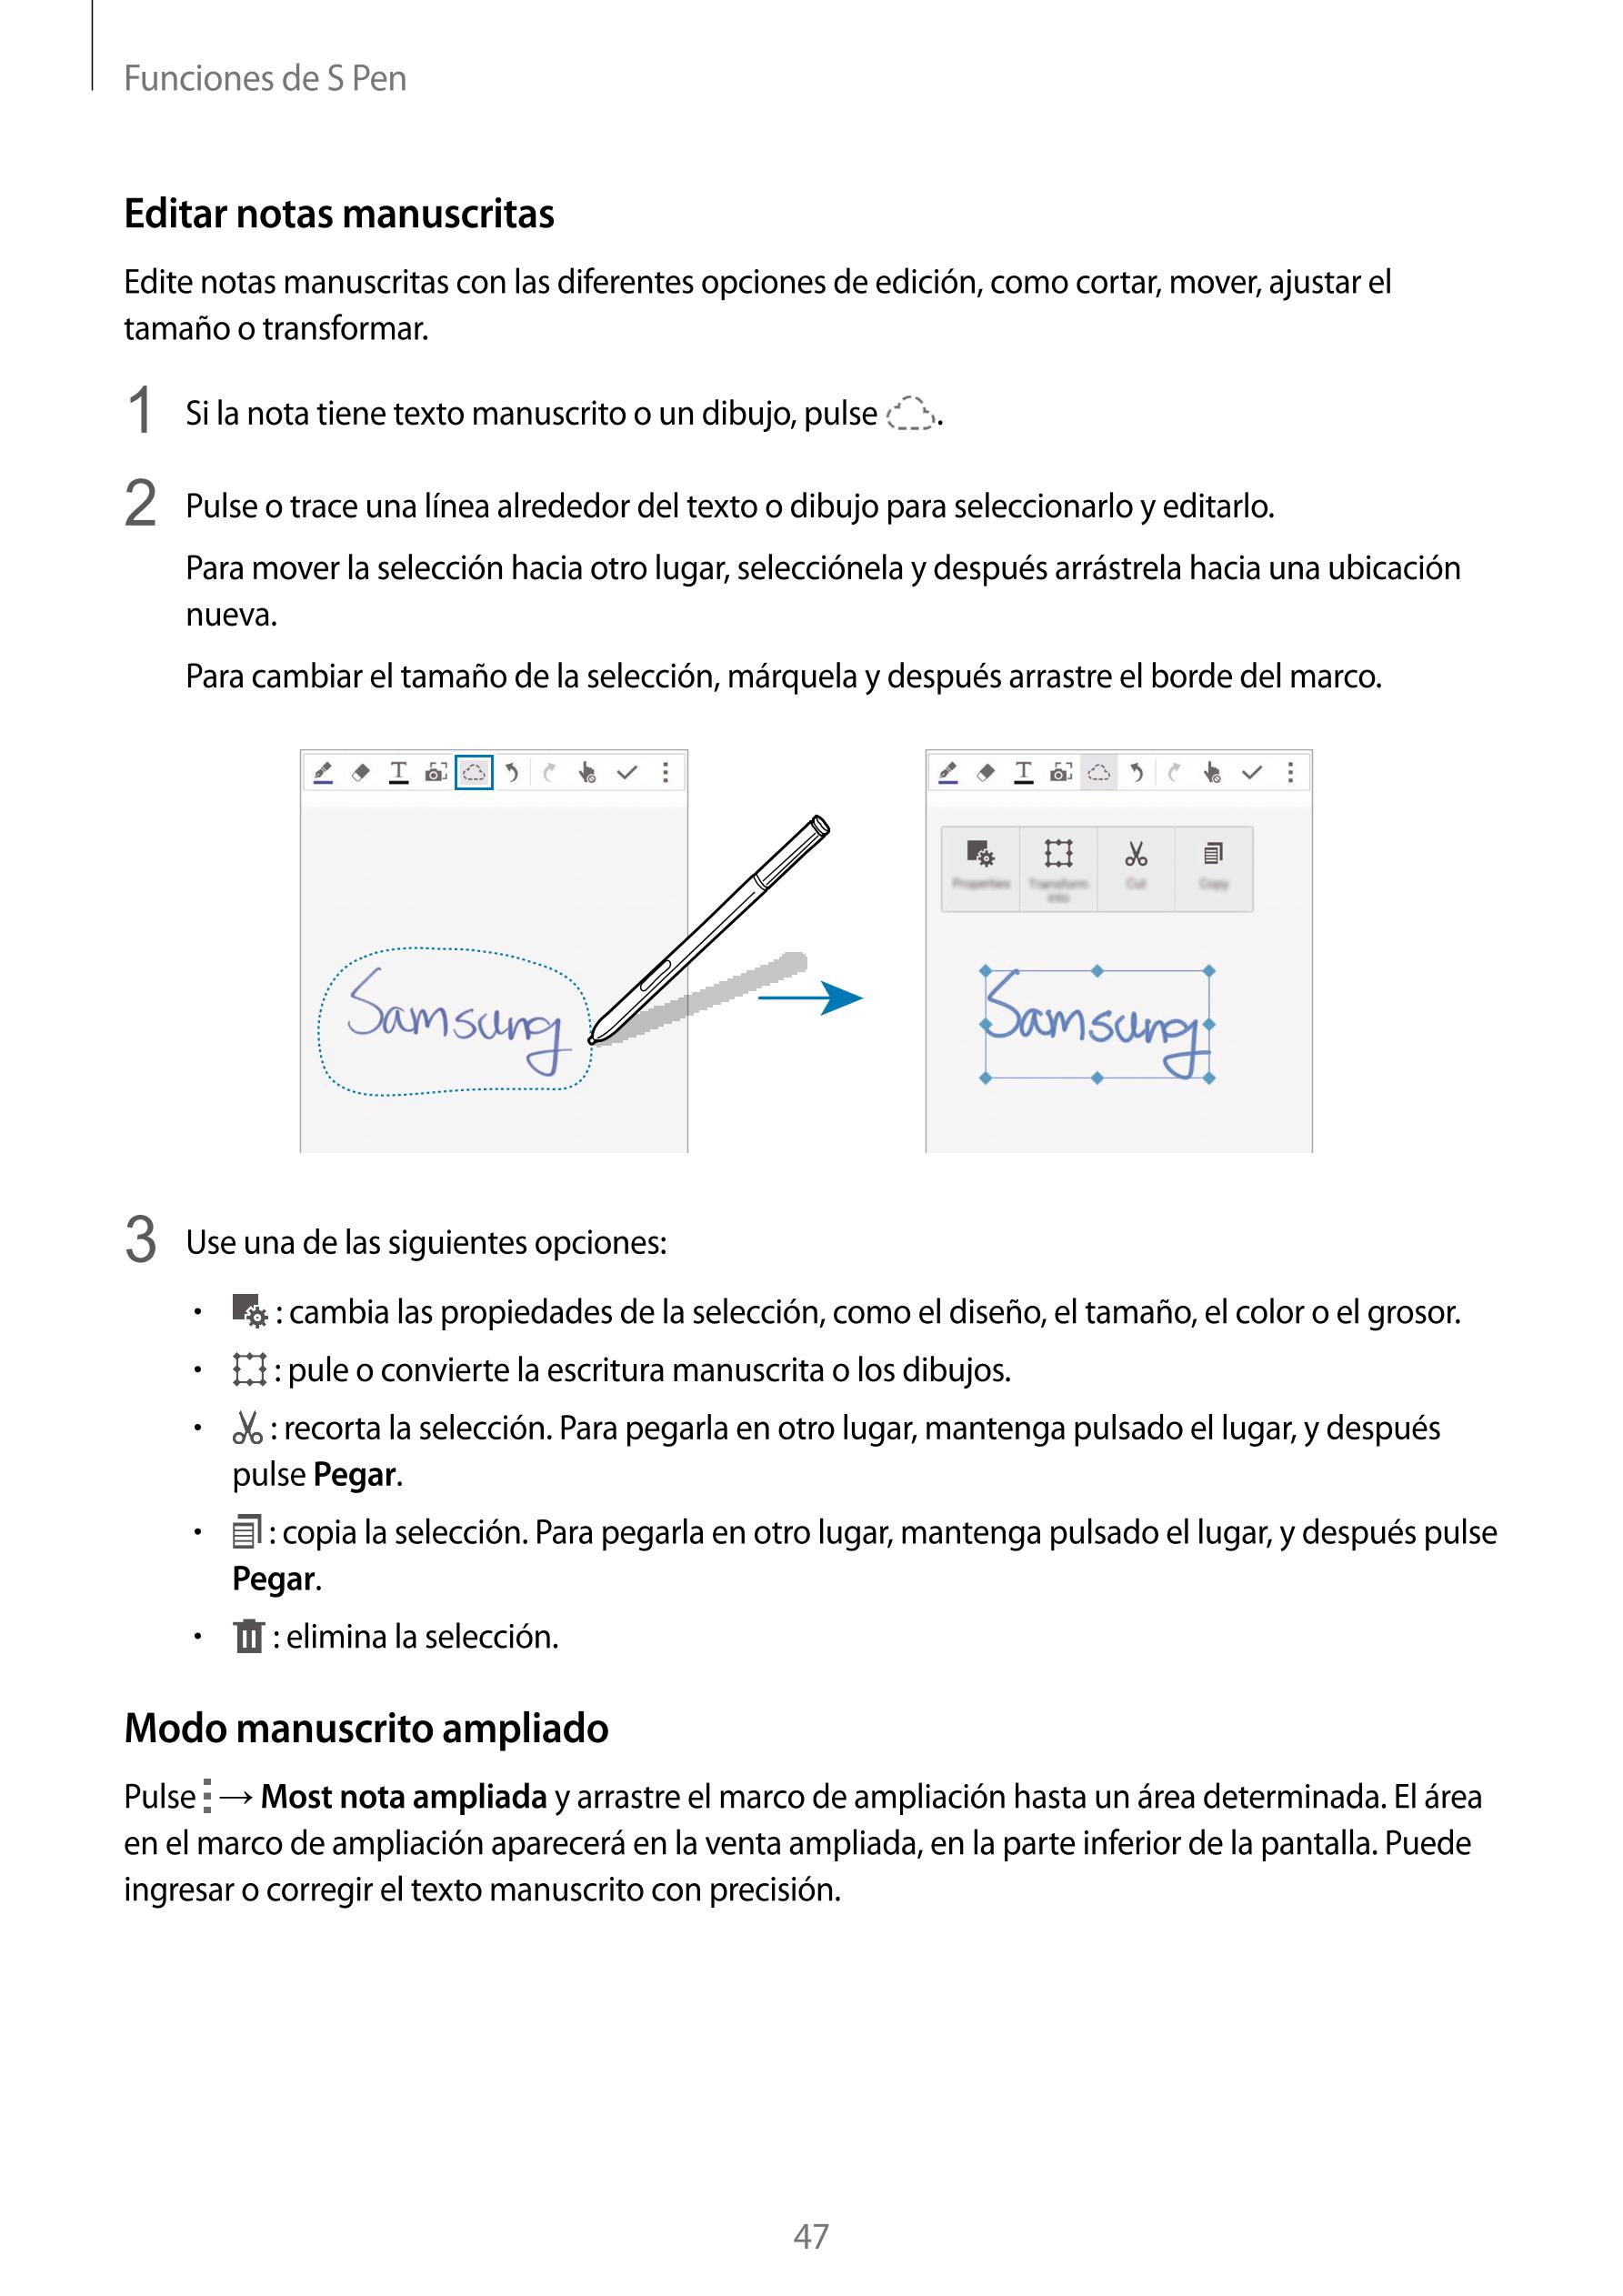 Manual - Samsung Galaxy Note 4 - Android 4.4 - Guías Smart